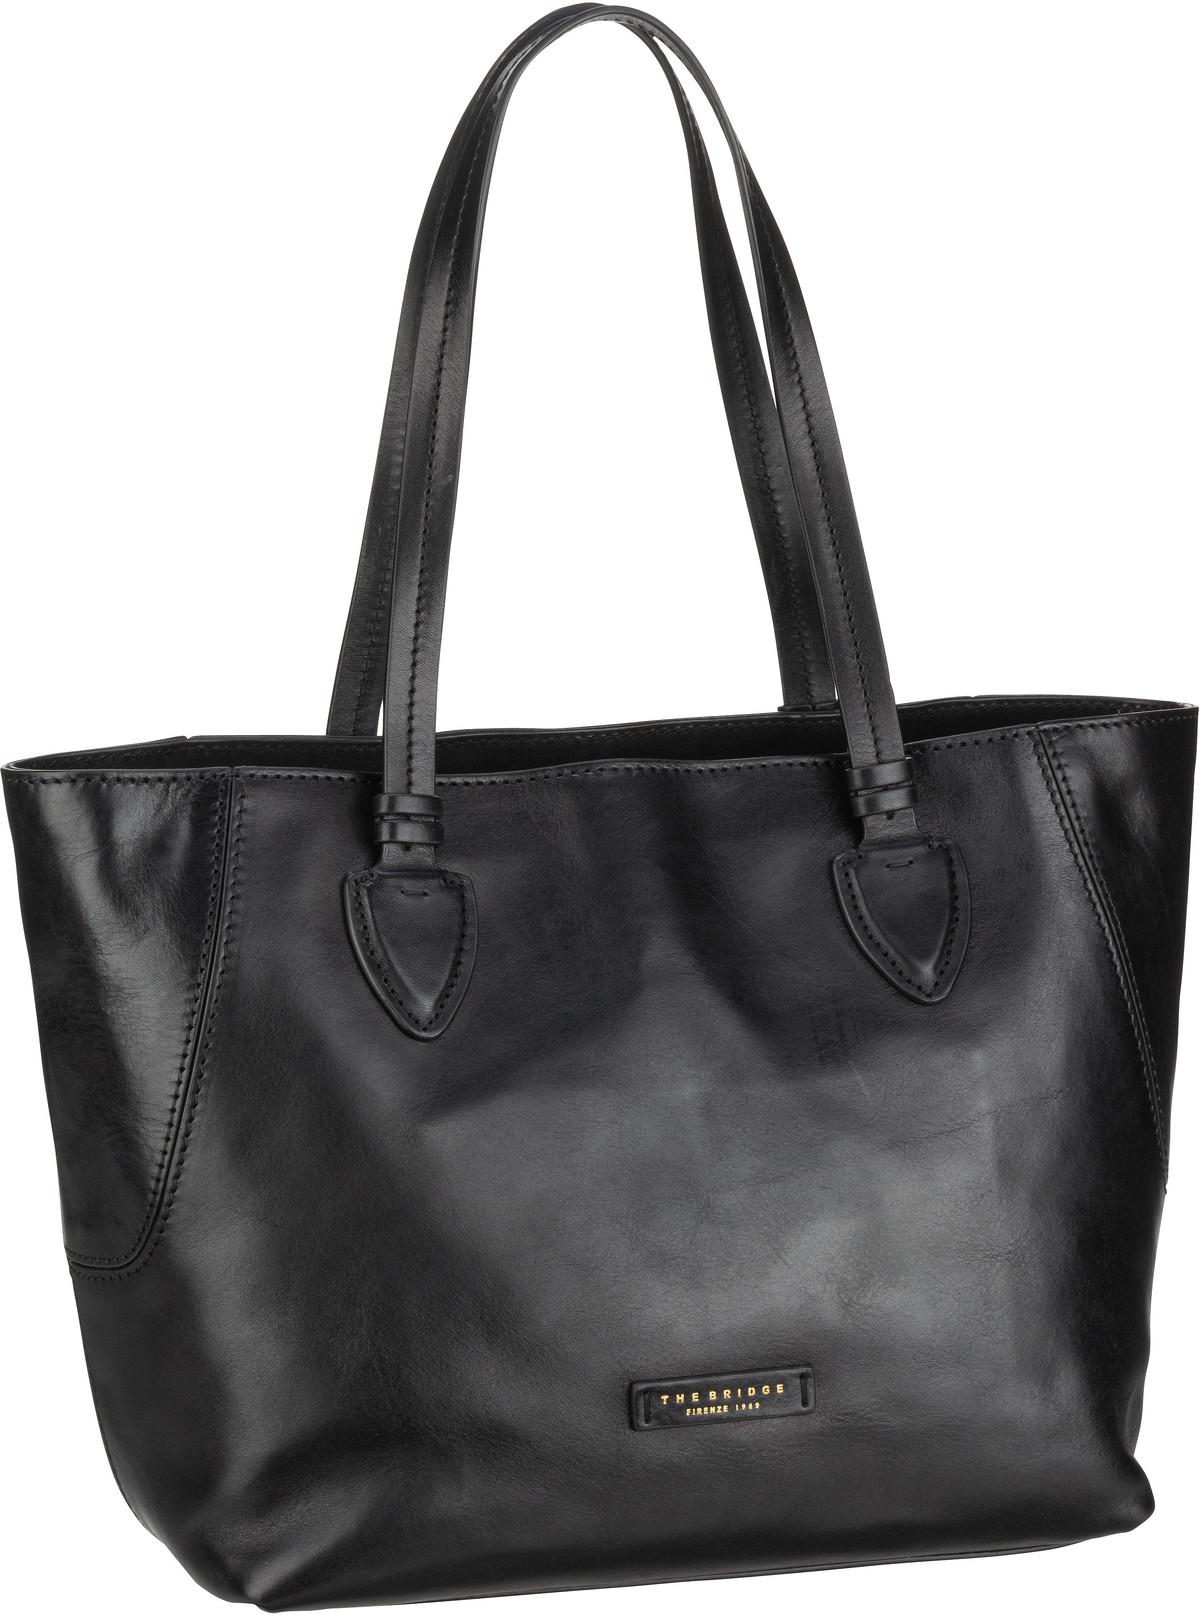 Handtasche Caterina 4730 Nero/Oro